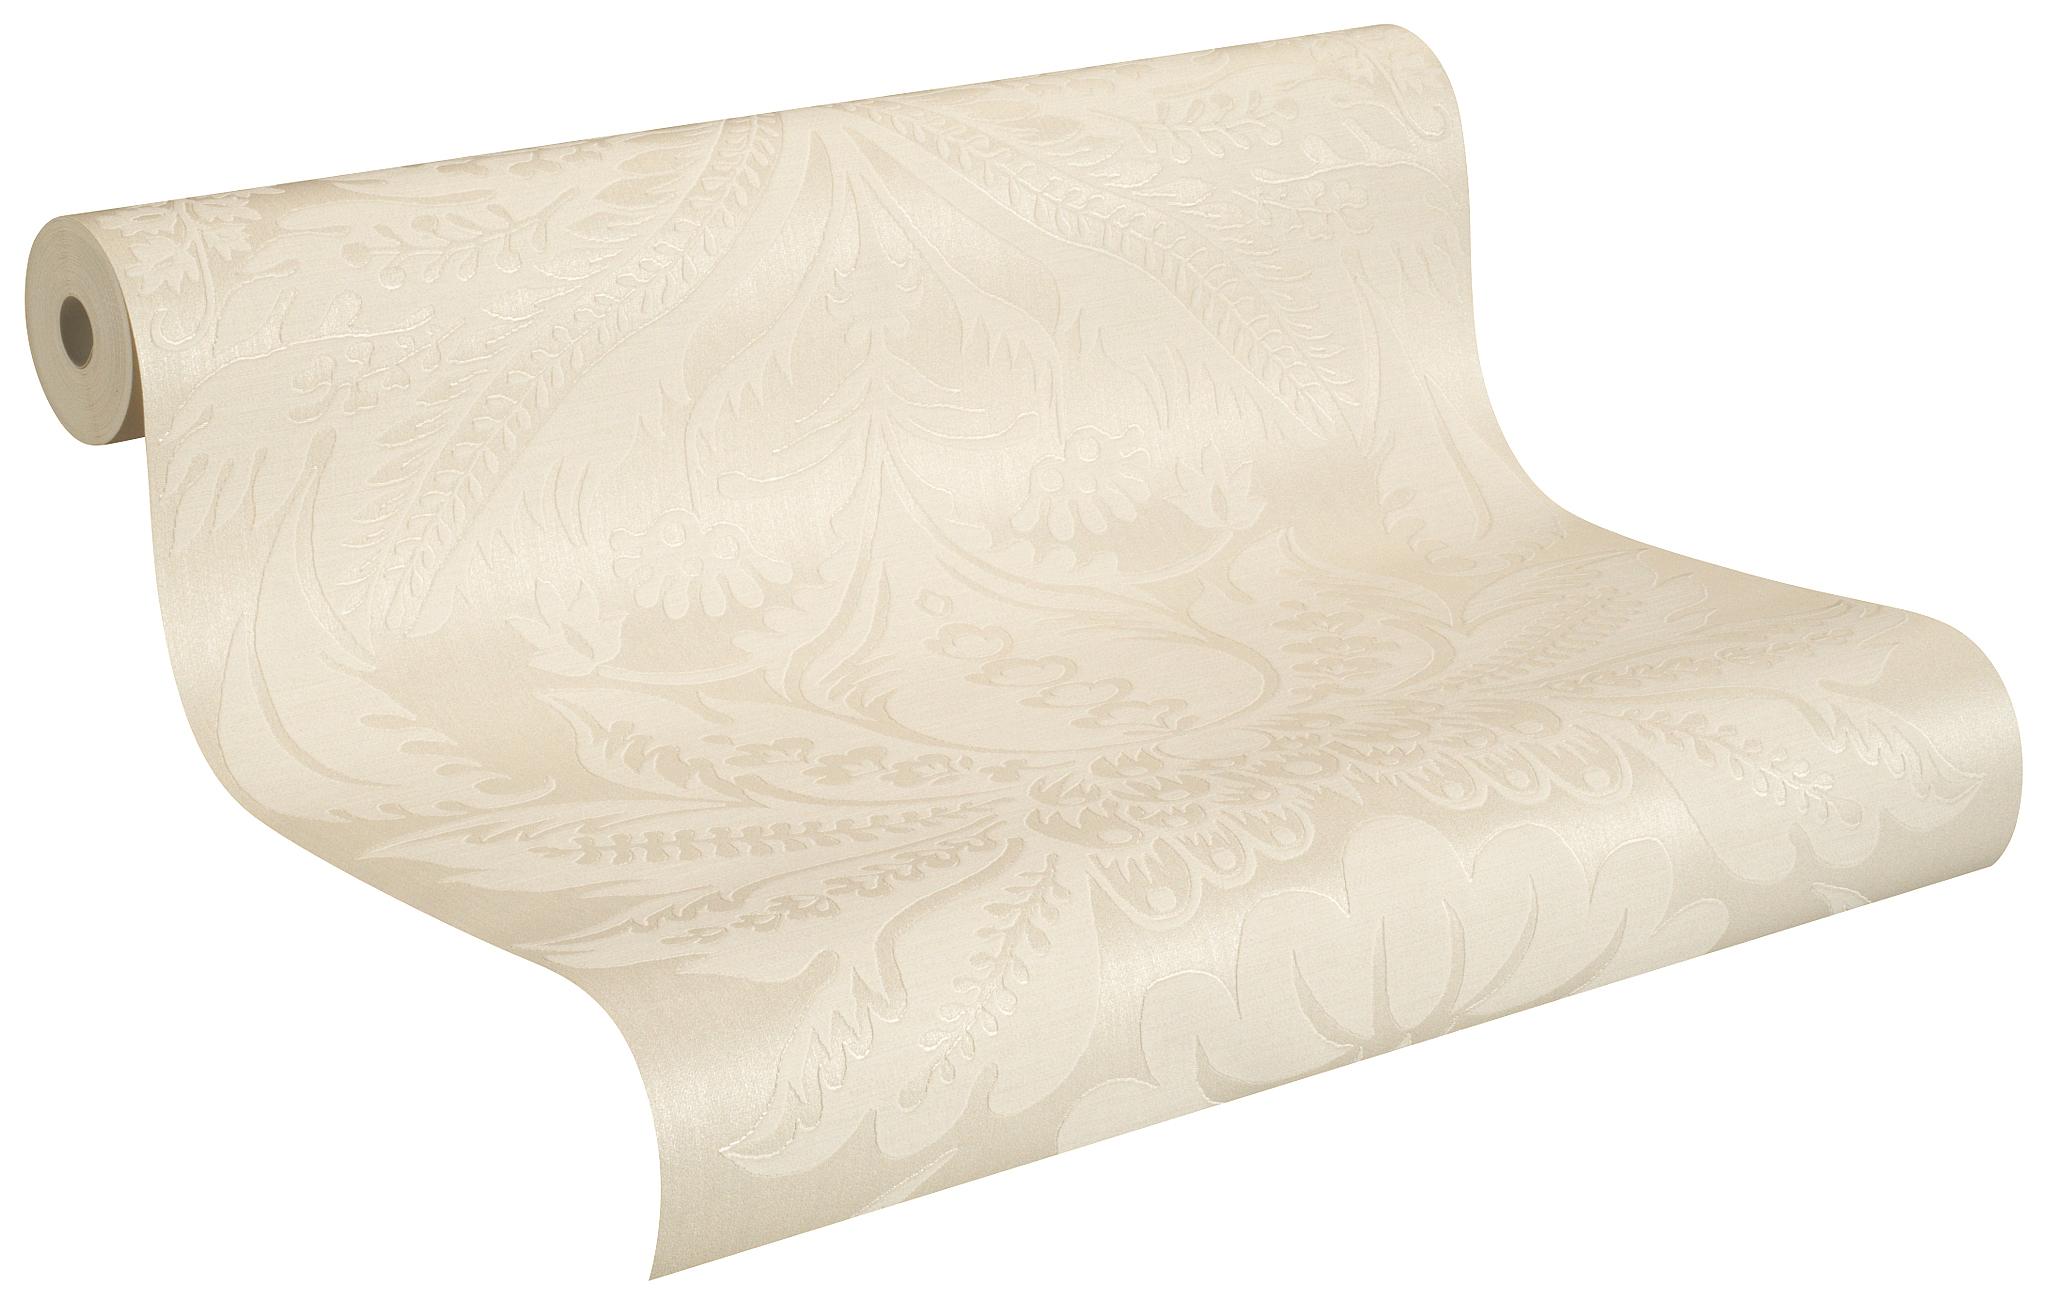 rasch tapete trianon xi 515206 baroque papier peint non tiss. Black Bedroom Furniture Sets. Home Design Ideas